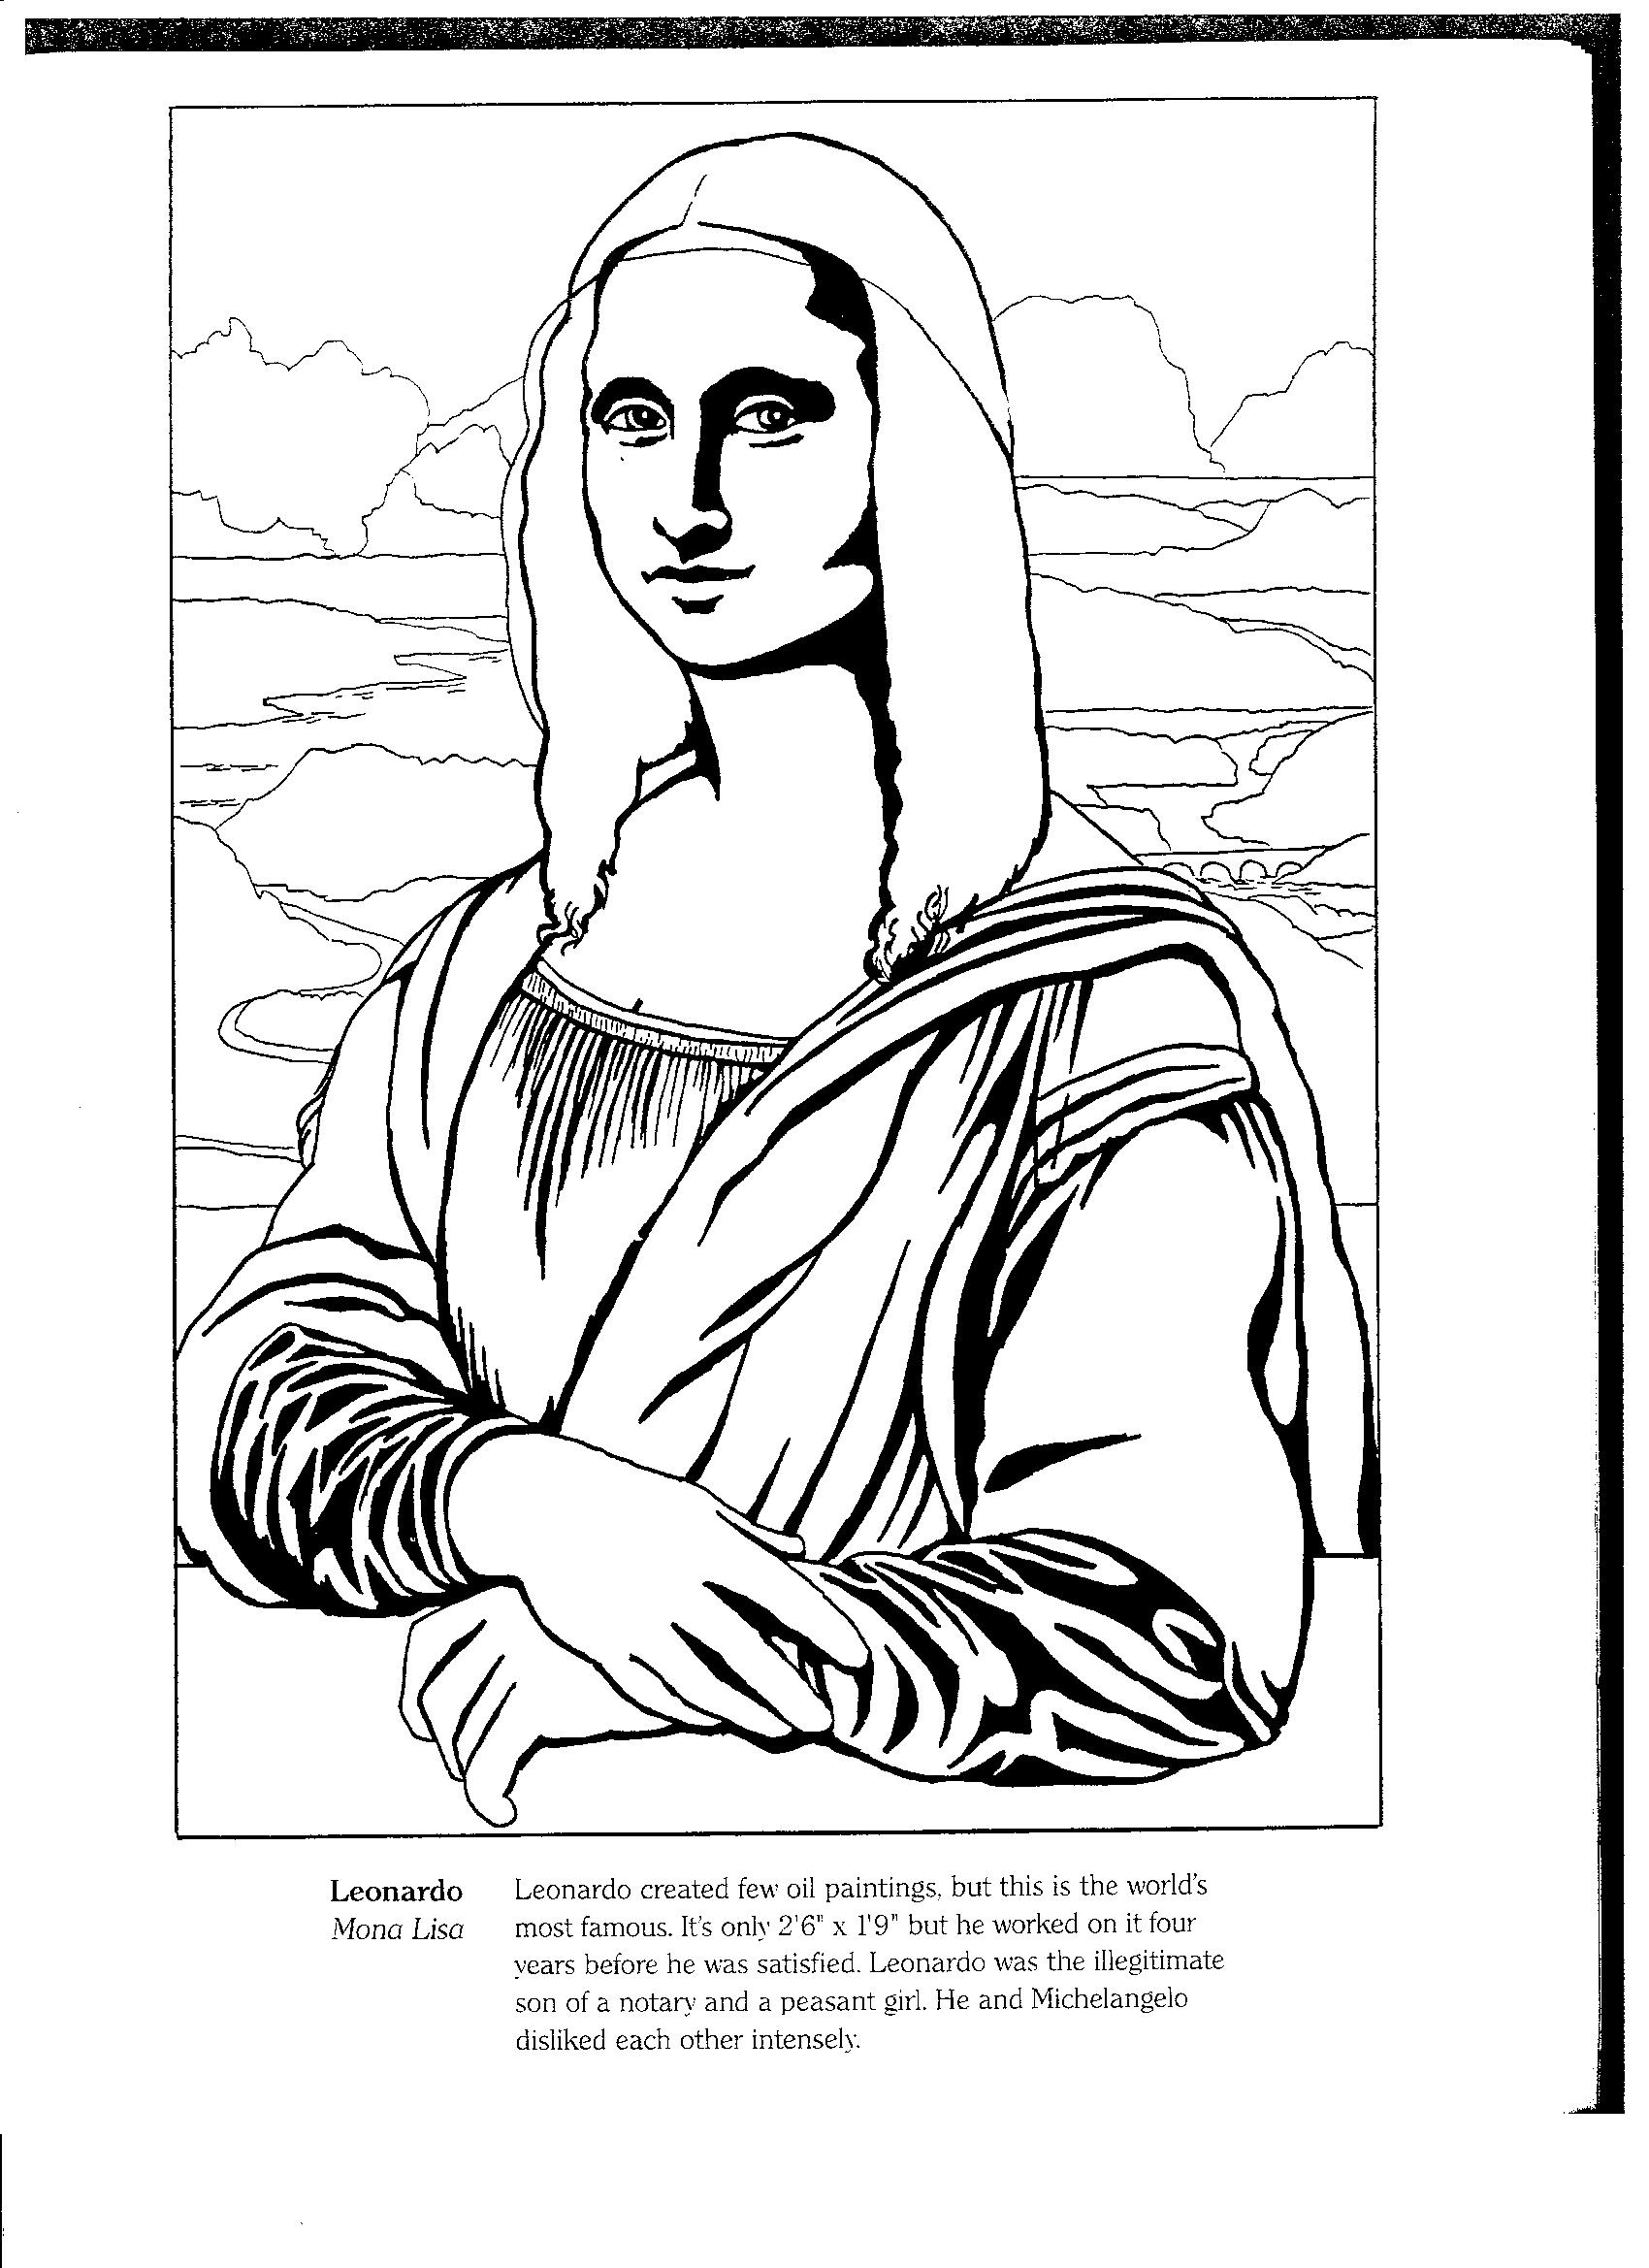 Renaissance clipart mona lisa #10